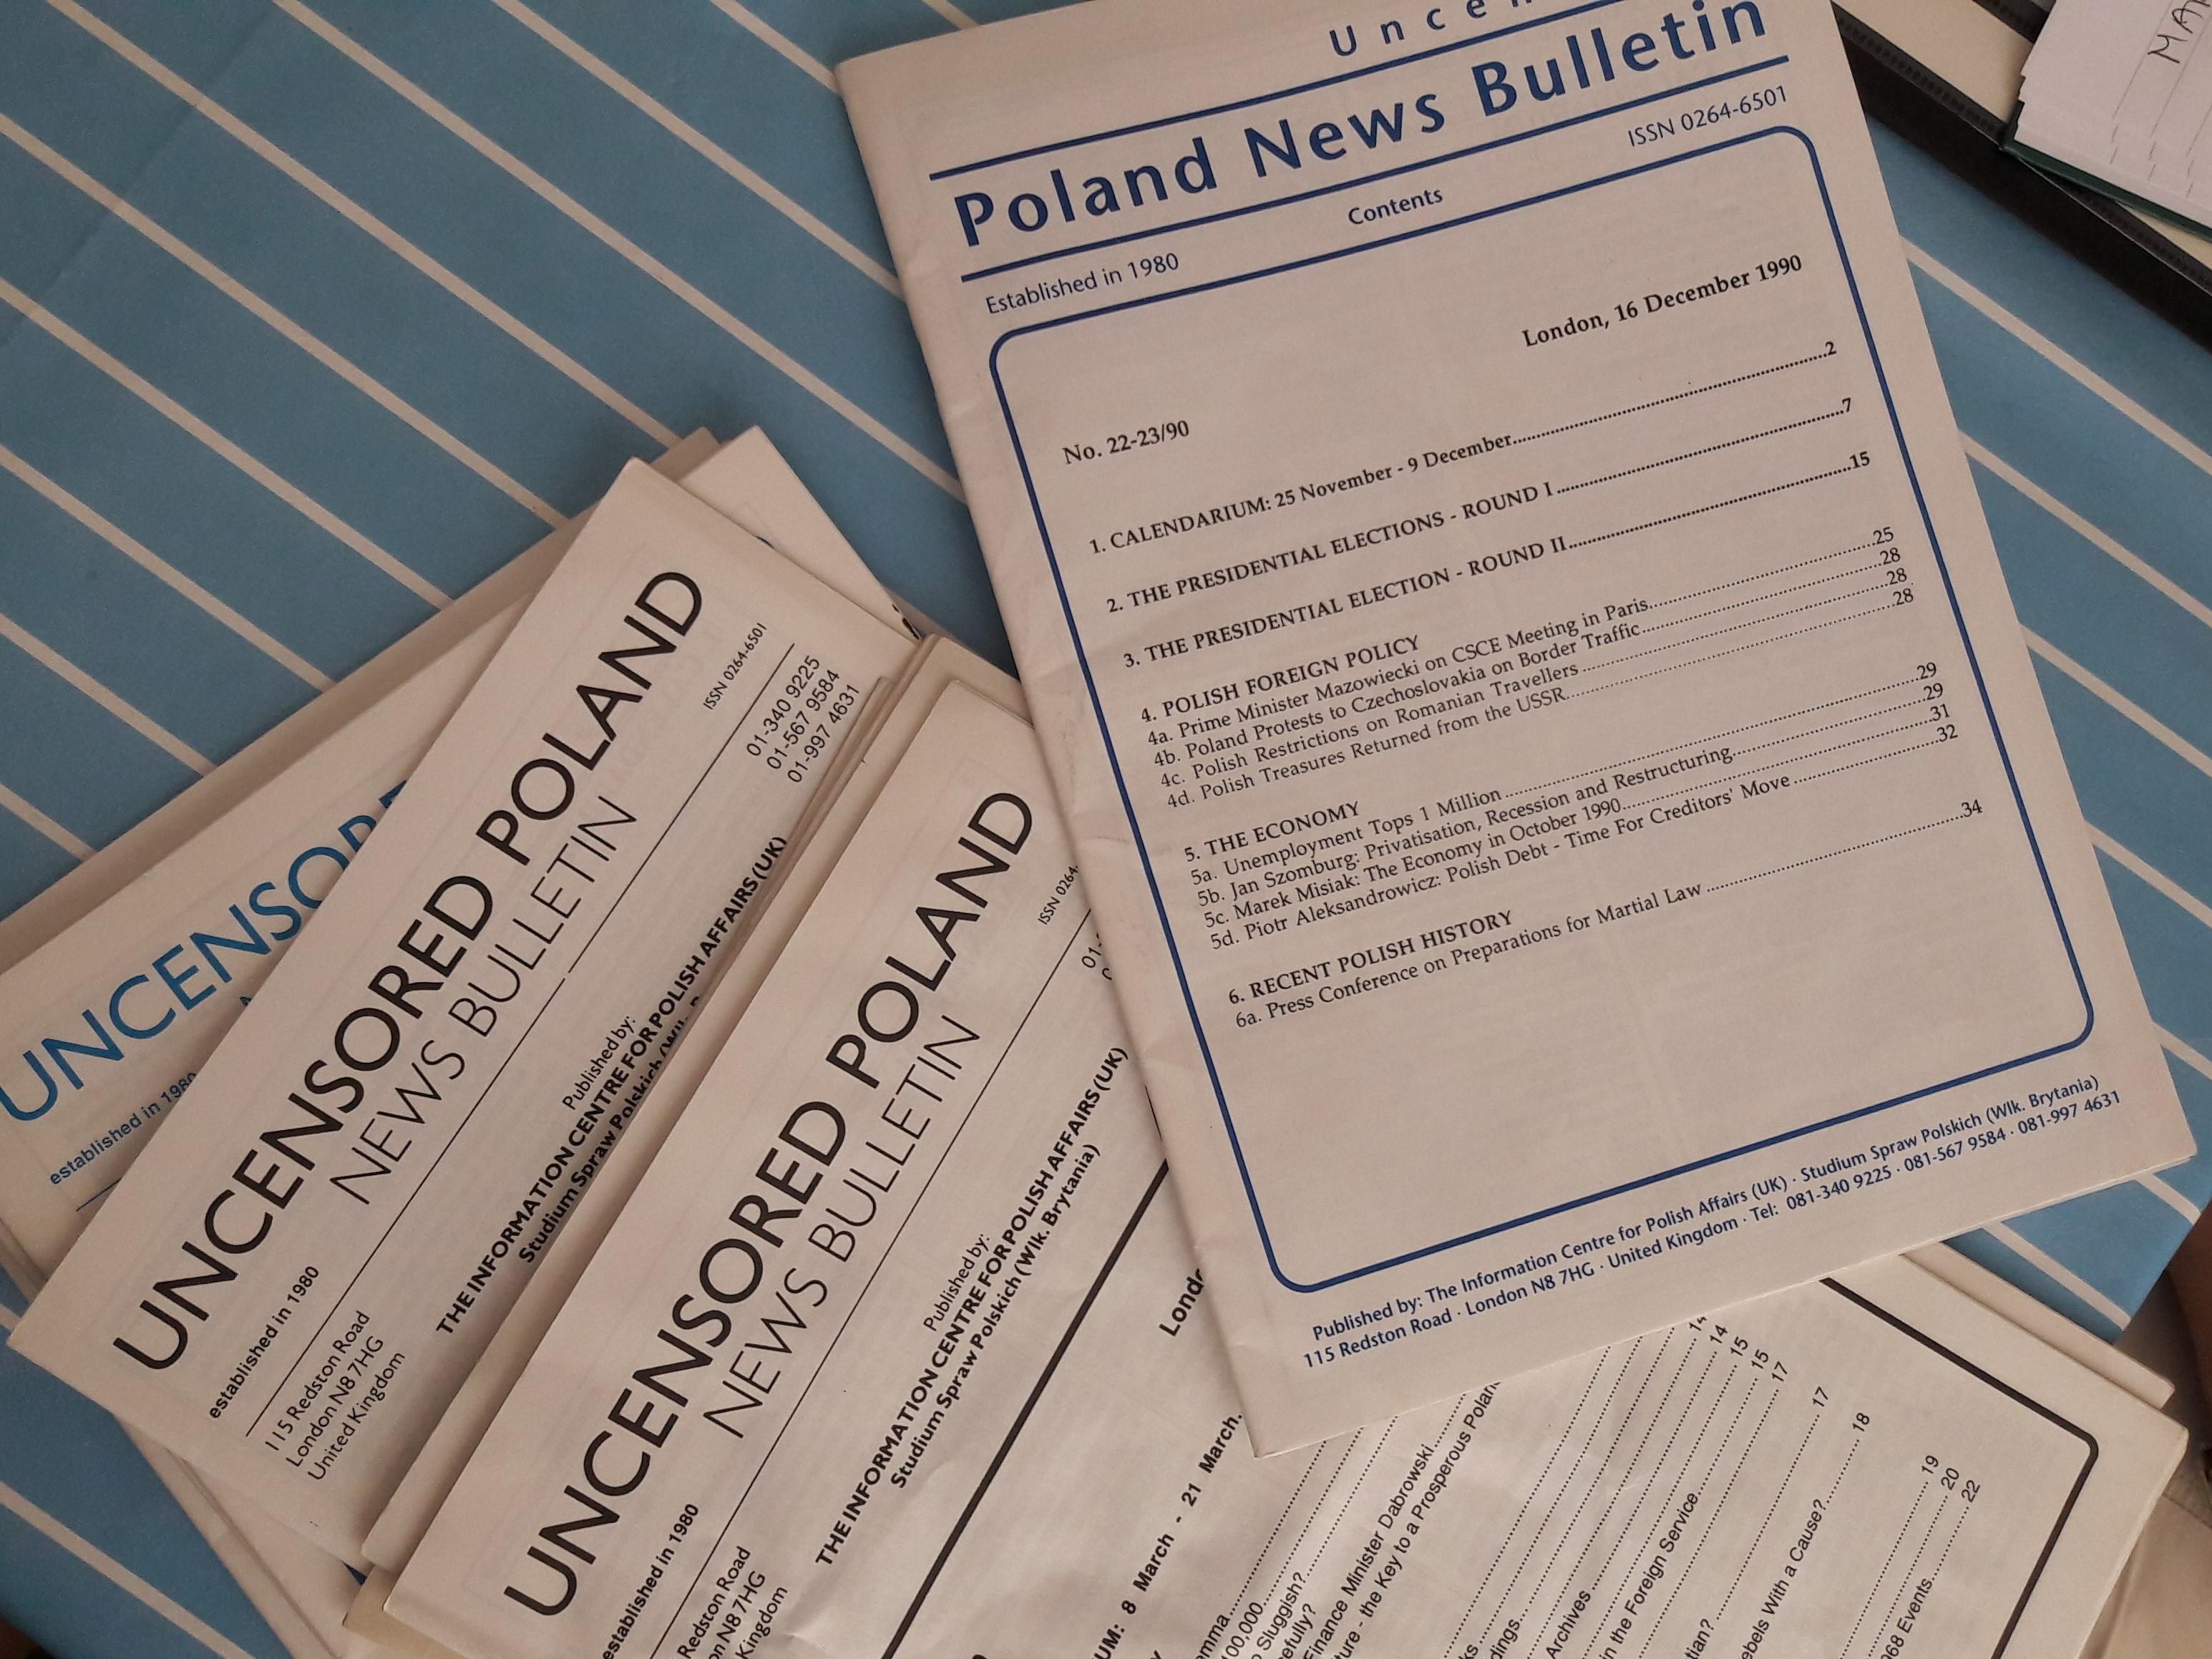 Poland News Bulletin